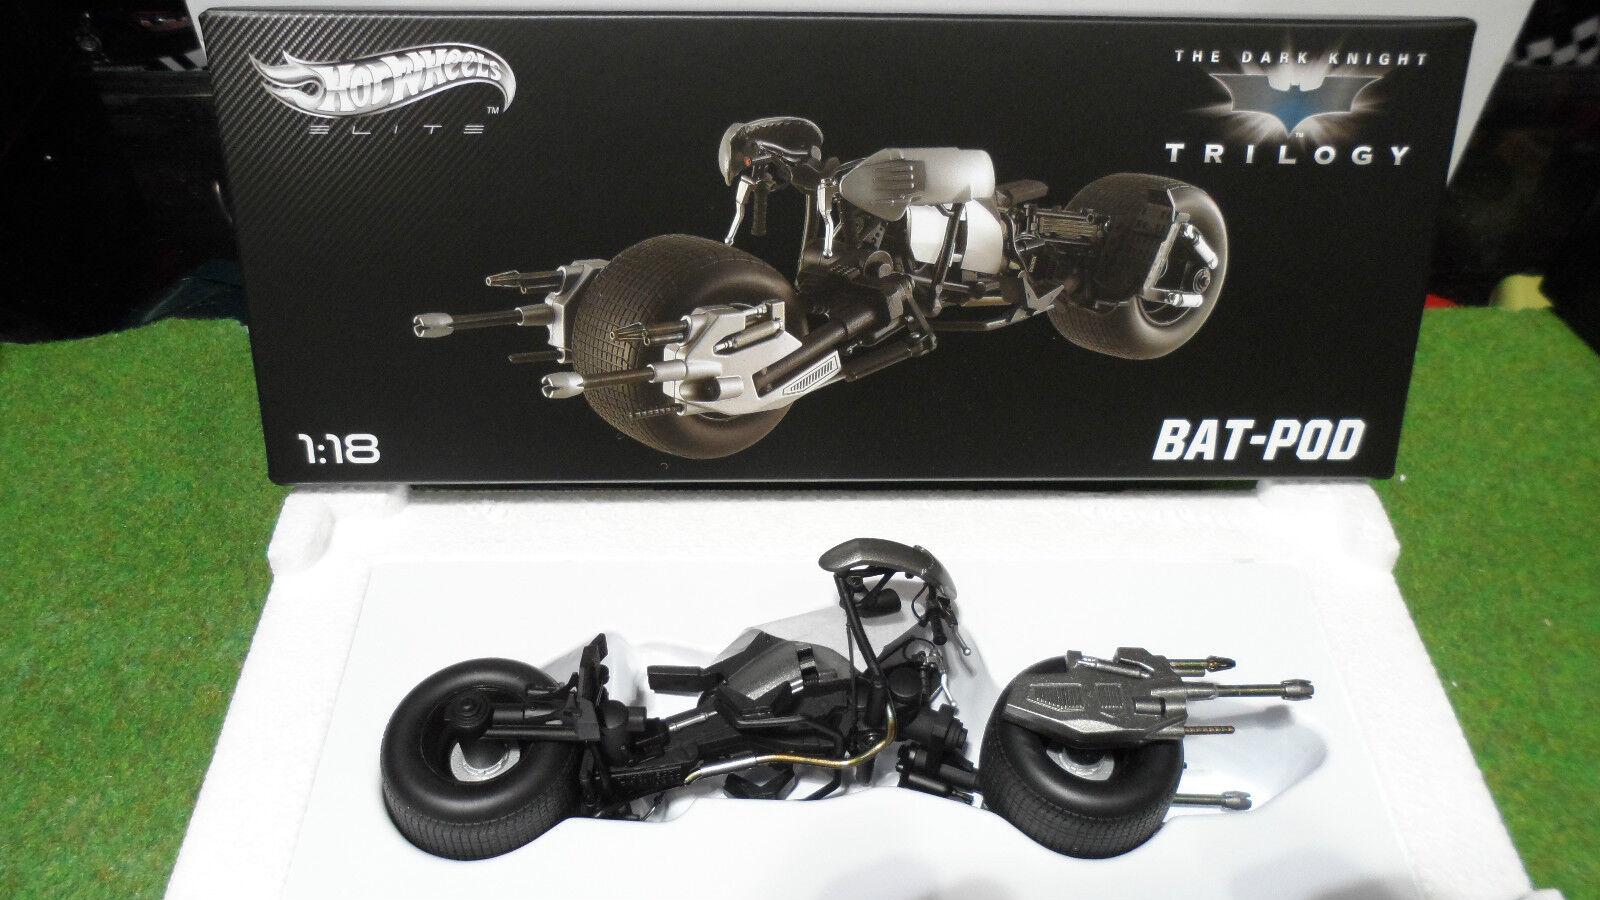 MOTO BAT-POD THE DARK KNIGHT TRILOGY BATMAN 1 18 HOT WHEELS ELITE X5471 miniatur